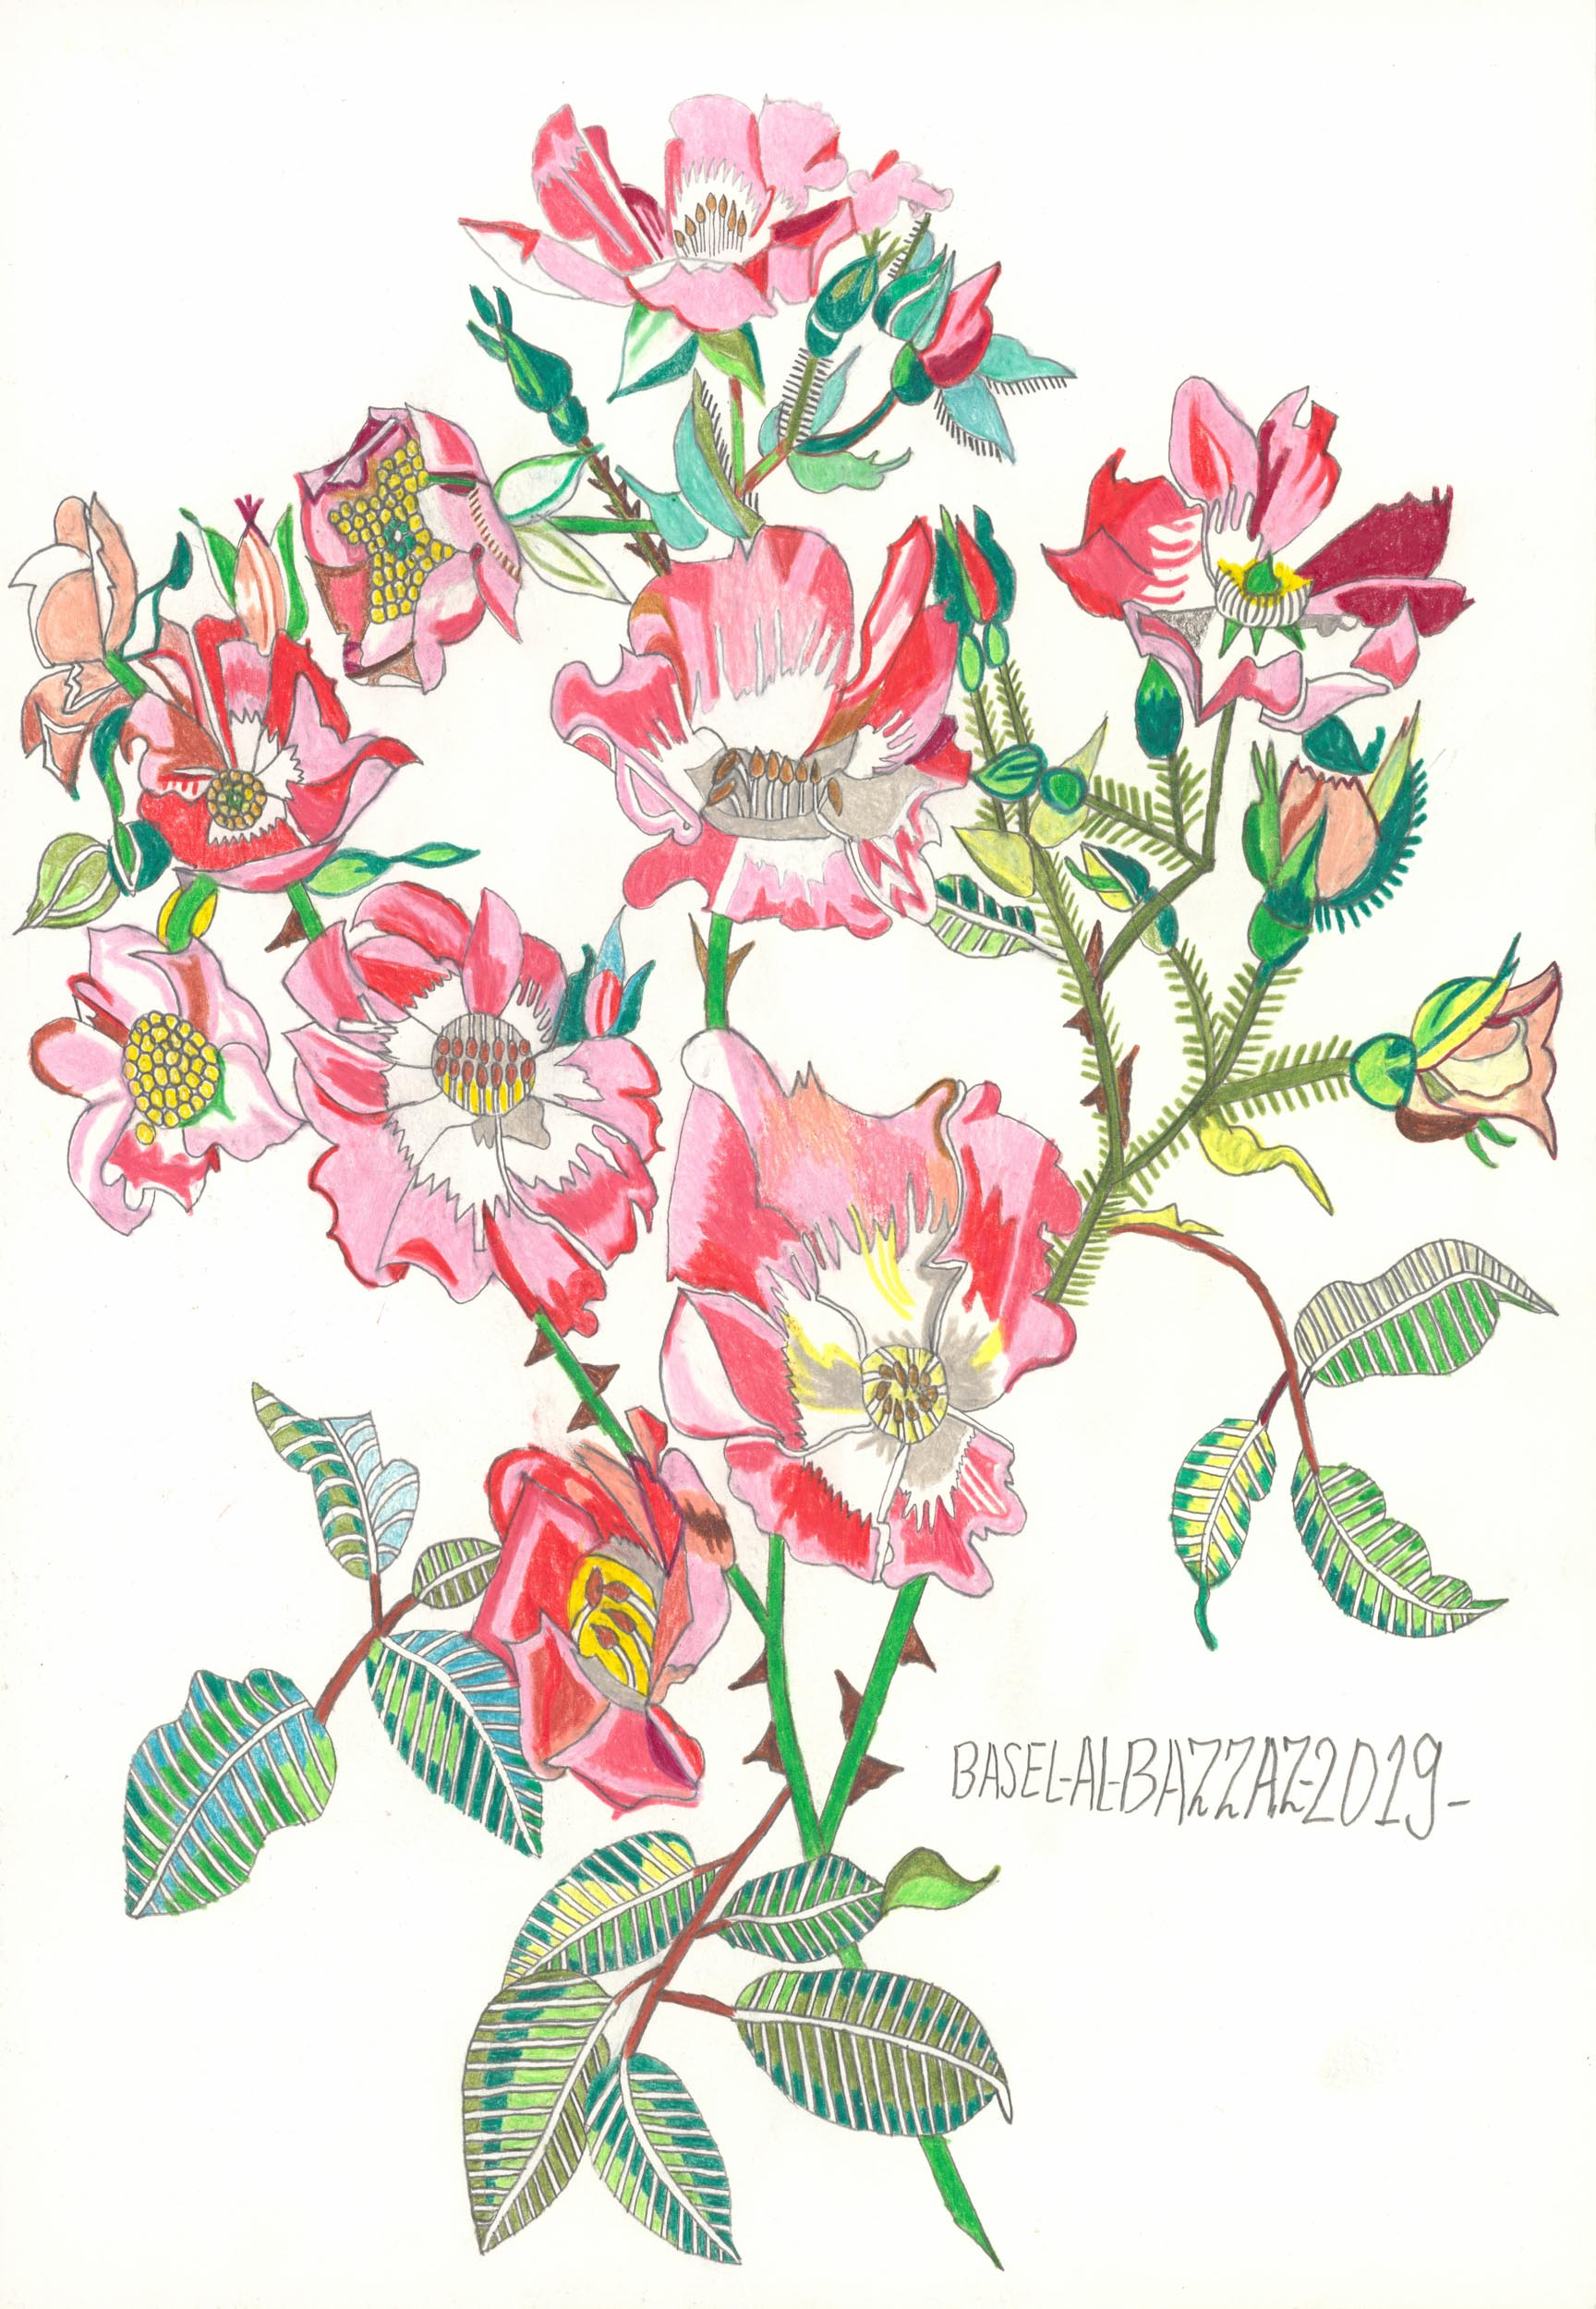 al-bazzaz basel - Heckenrose / Dog rose